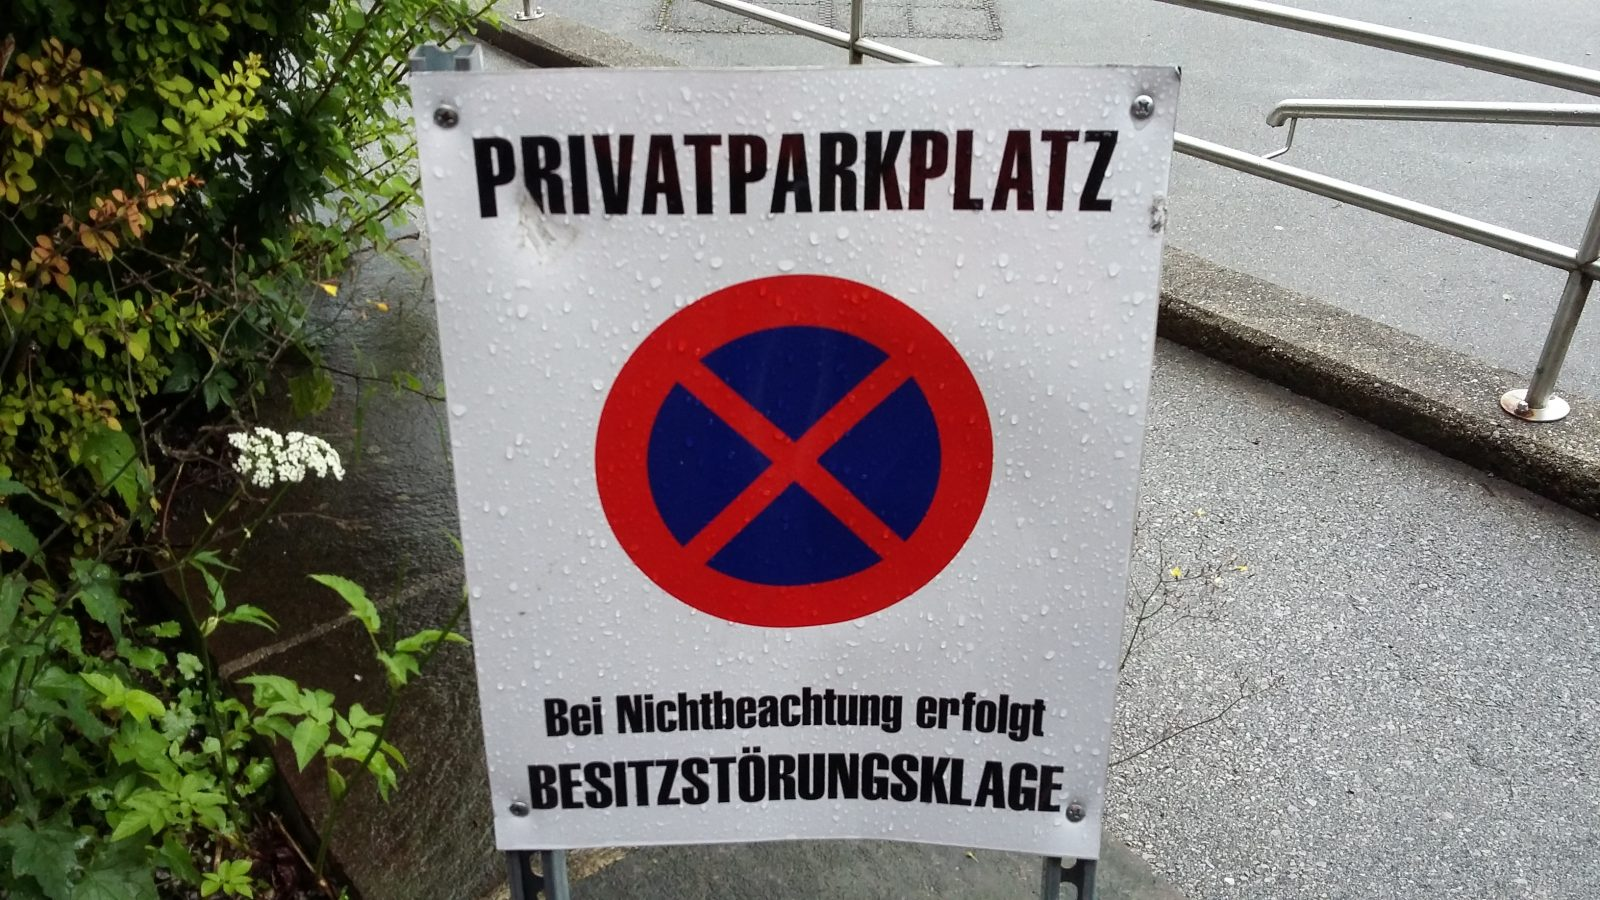 Servicepionier_Servicekomplize_Armin_Nagel_Orte_des_Grauens_Parkplatz (15)